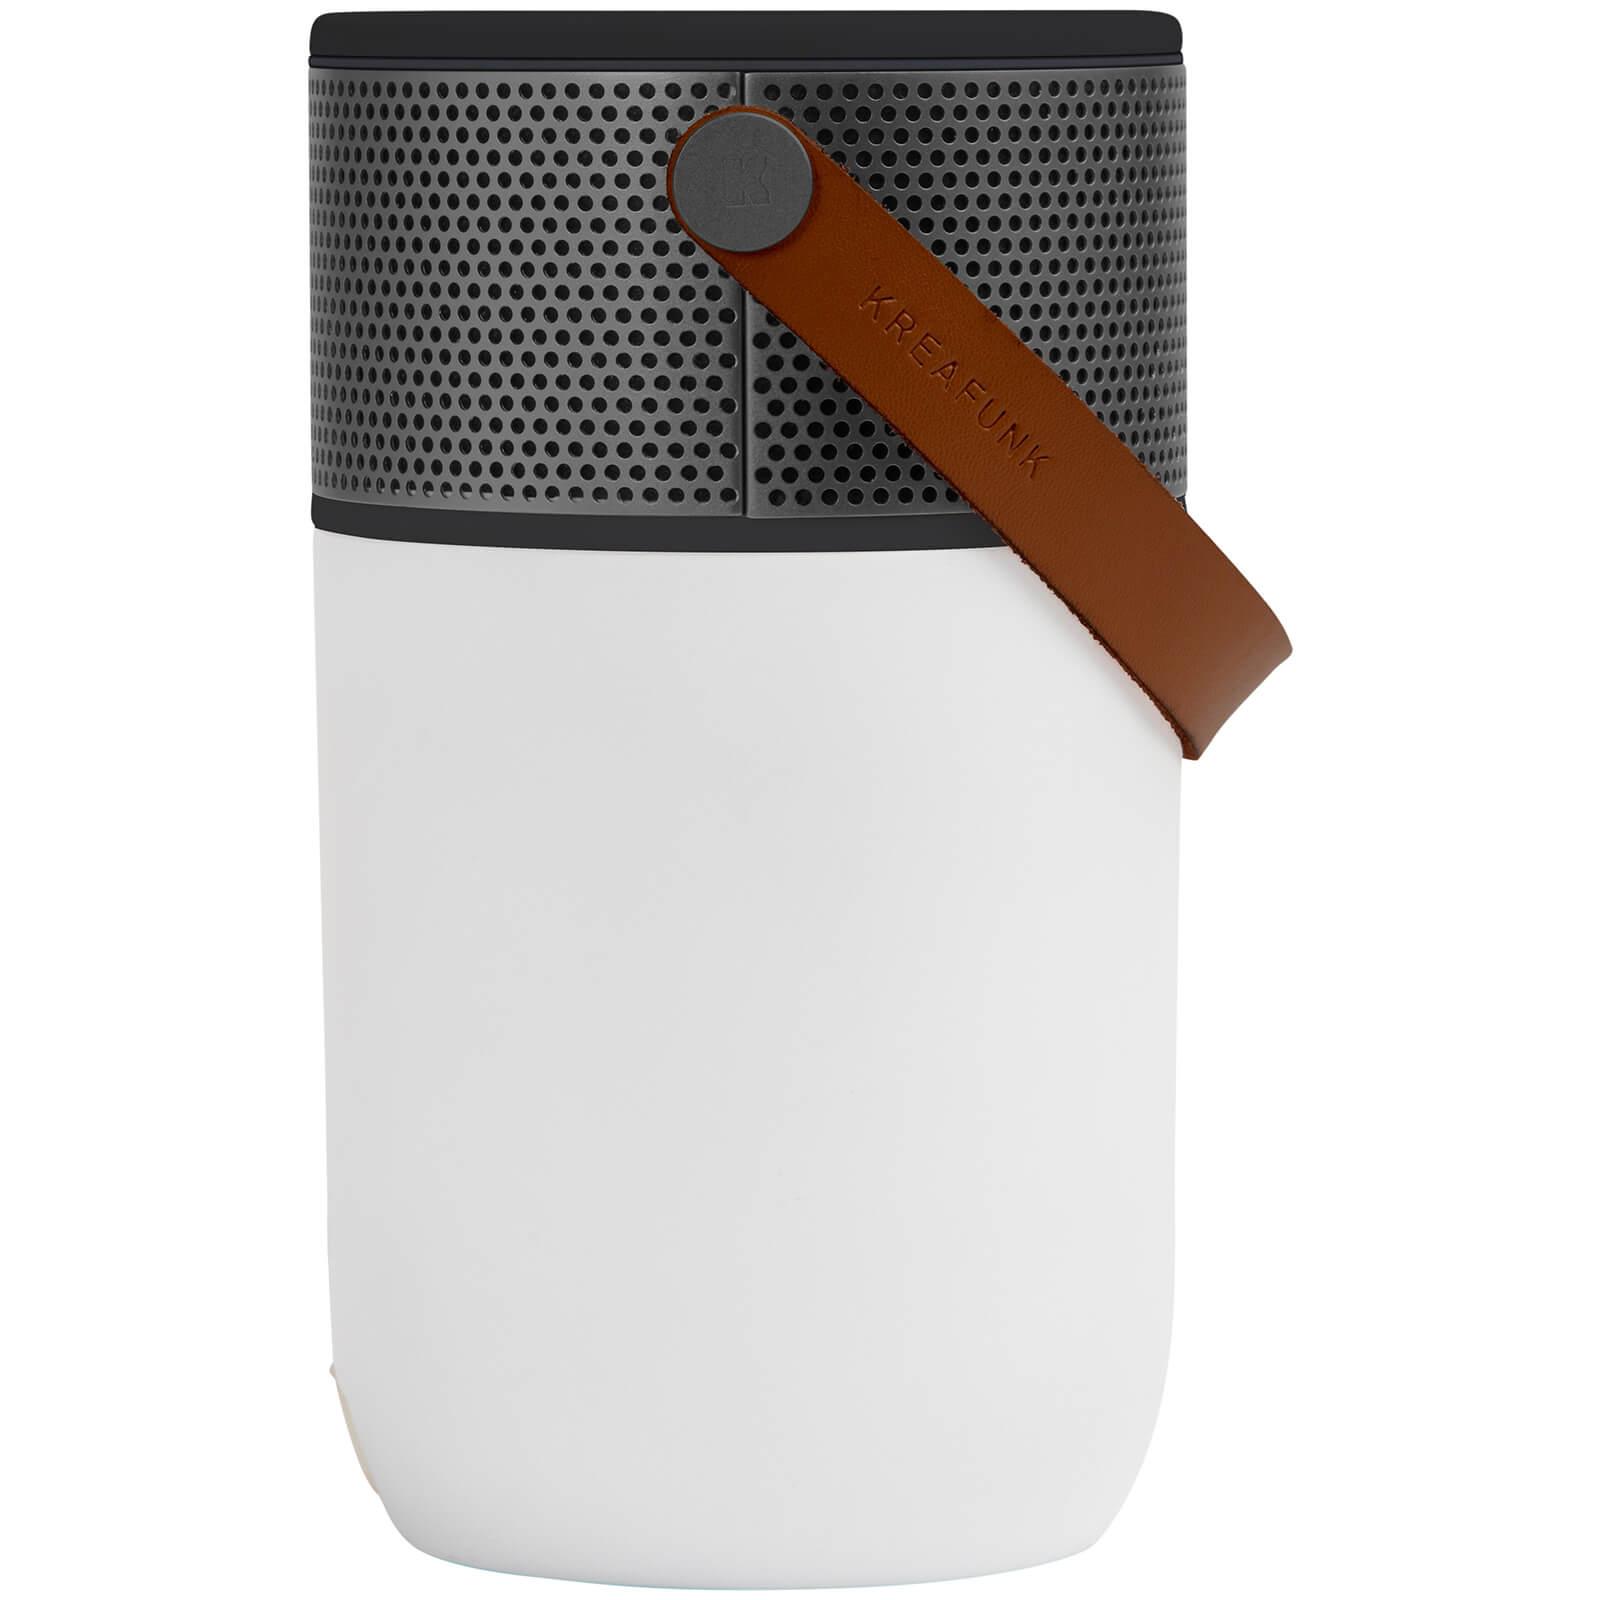 Kreafunk aGLOW Multifunctional Bluetooth Speaker - Black Edition